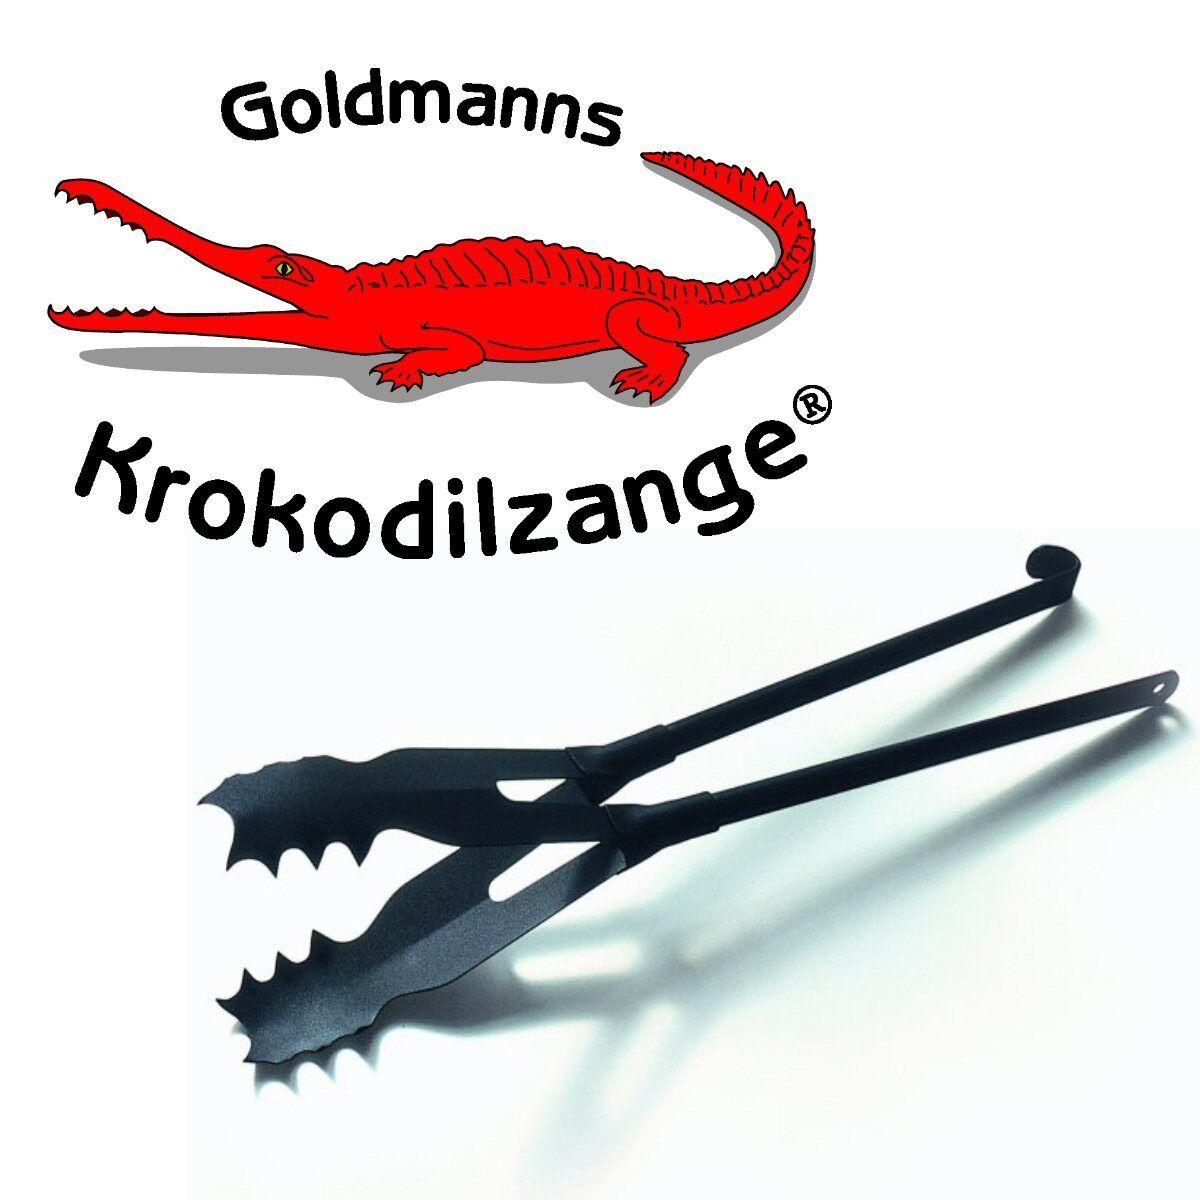 Goldmanns Krokodilzange - Die original Kaminzange - B-Ware